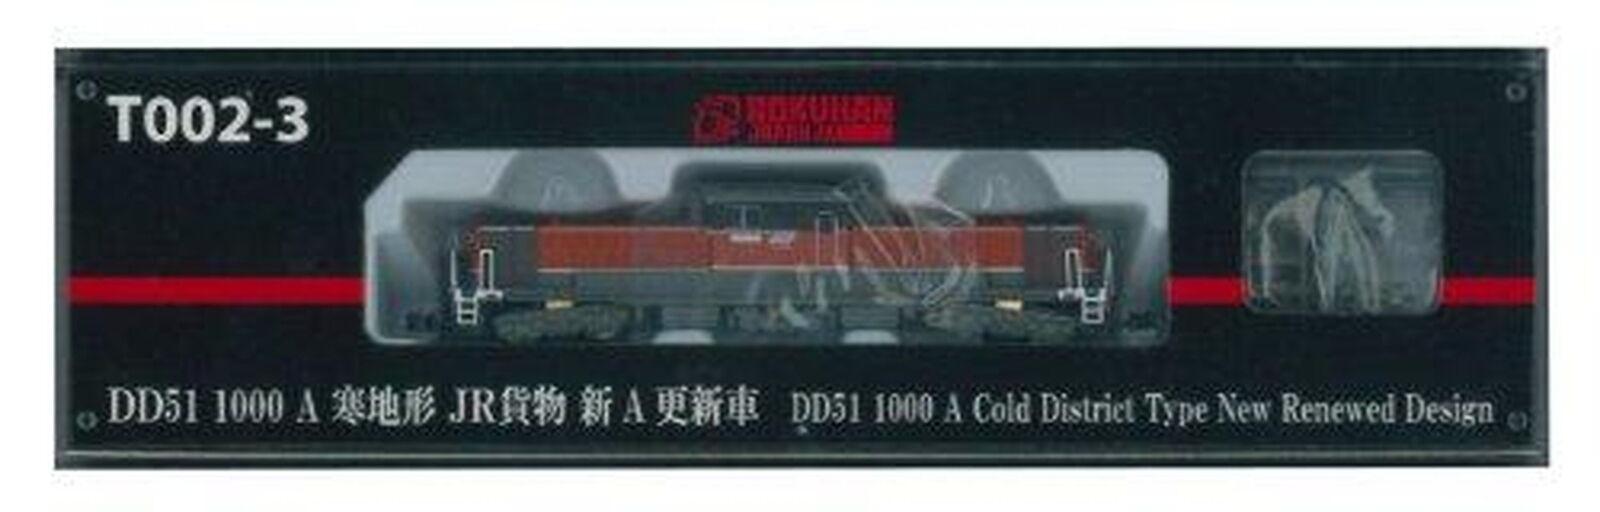 Z Gauge T002-3 Diesel Locomotive DD51 1000 Cold Dist Rokuhan JR Cargo